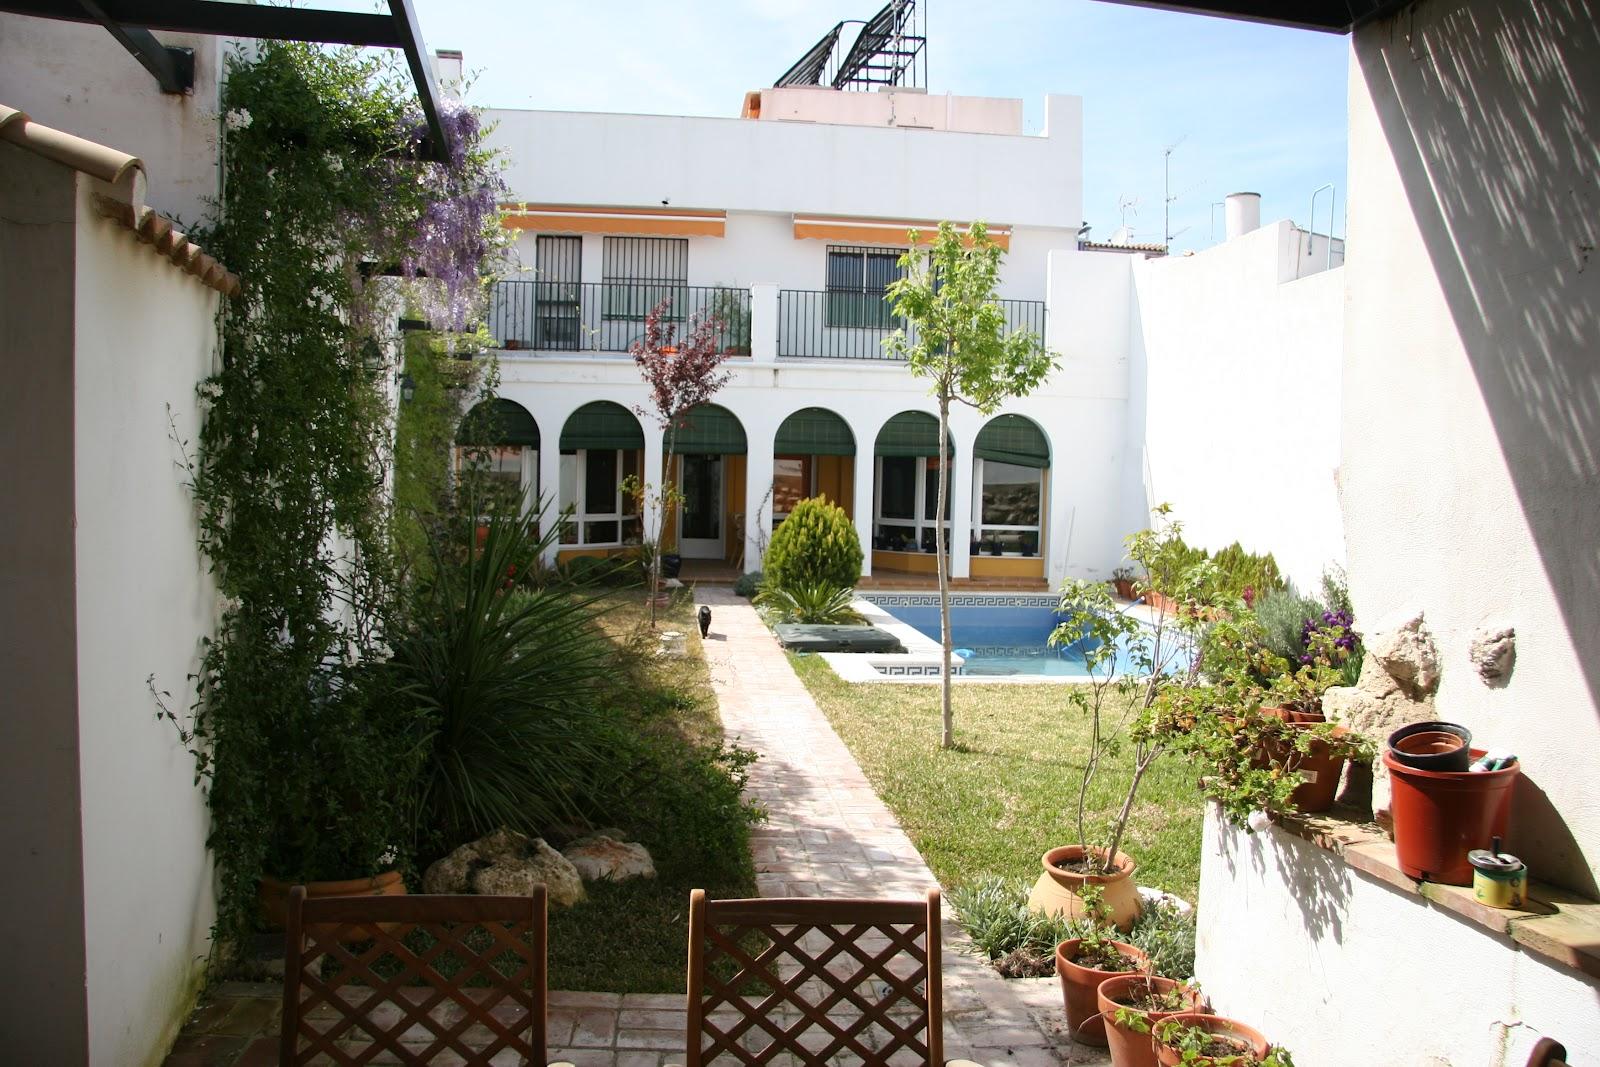 Infocasa inmobiliaria casa con piscina en el centro de cabra - Casa en sabadell centro ...